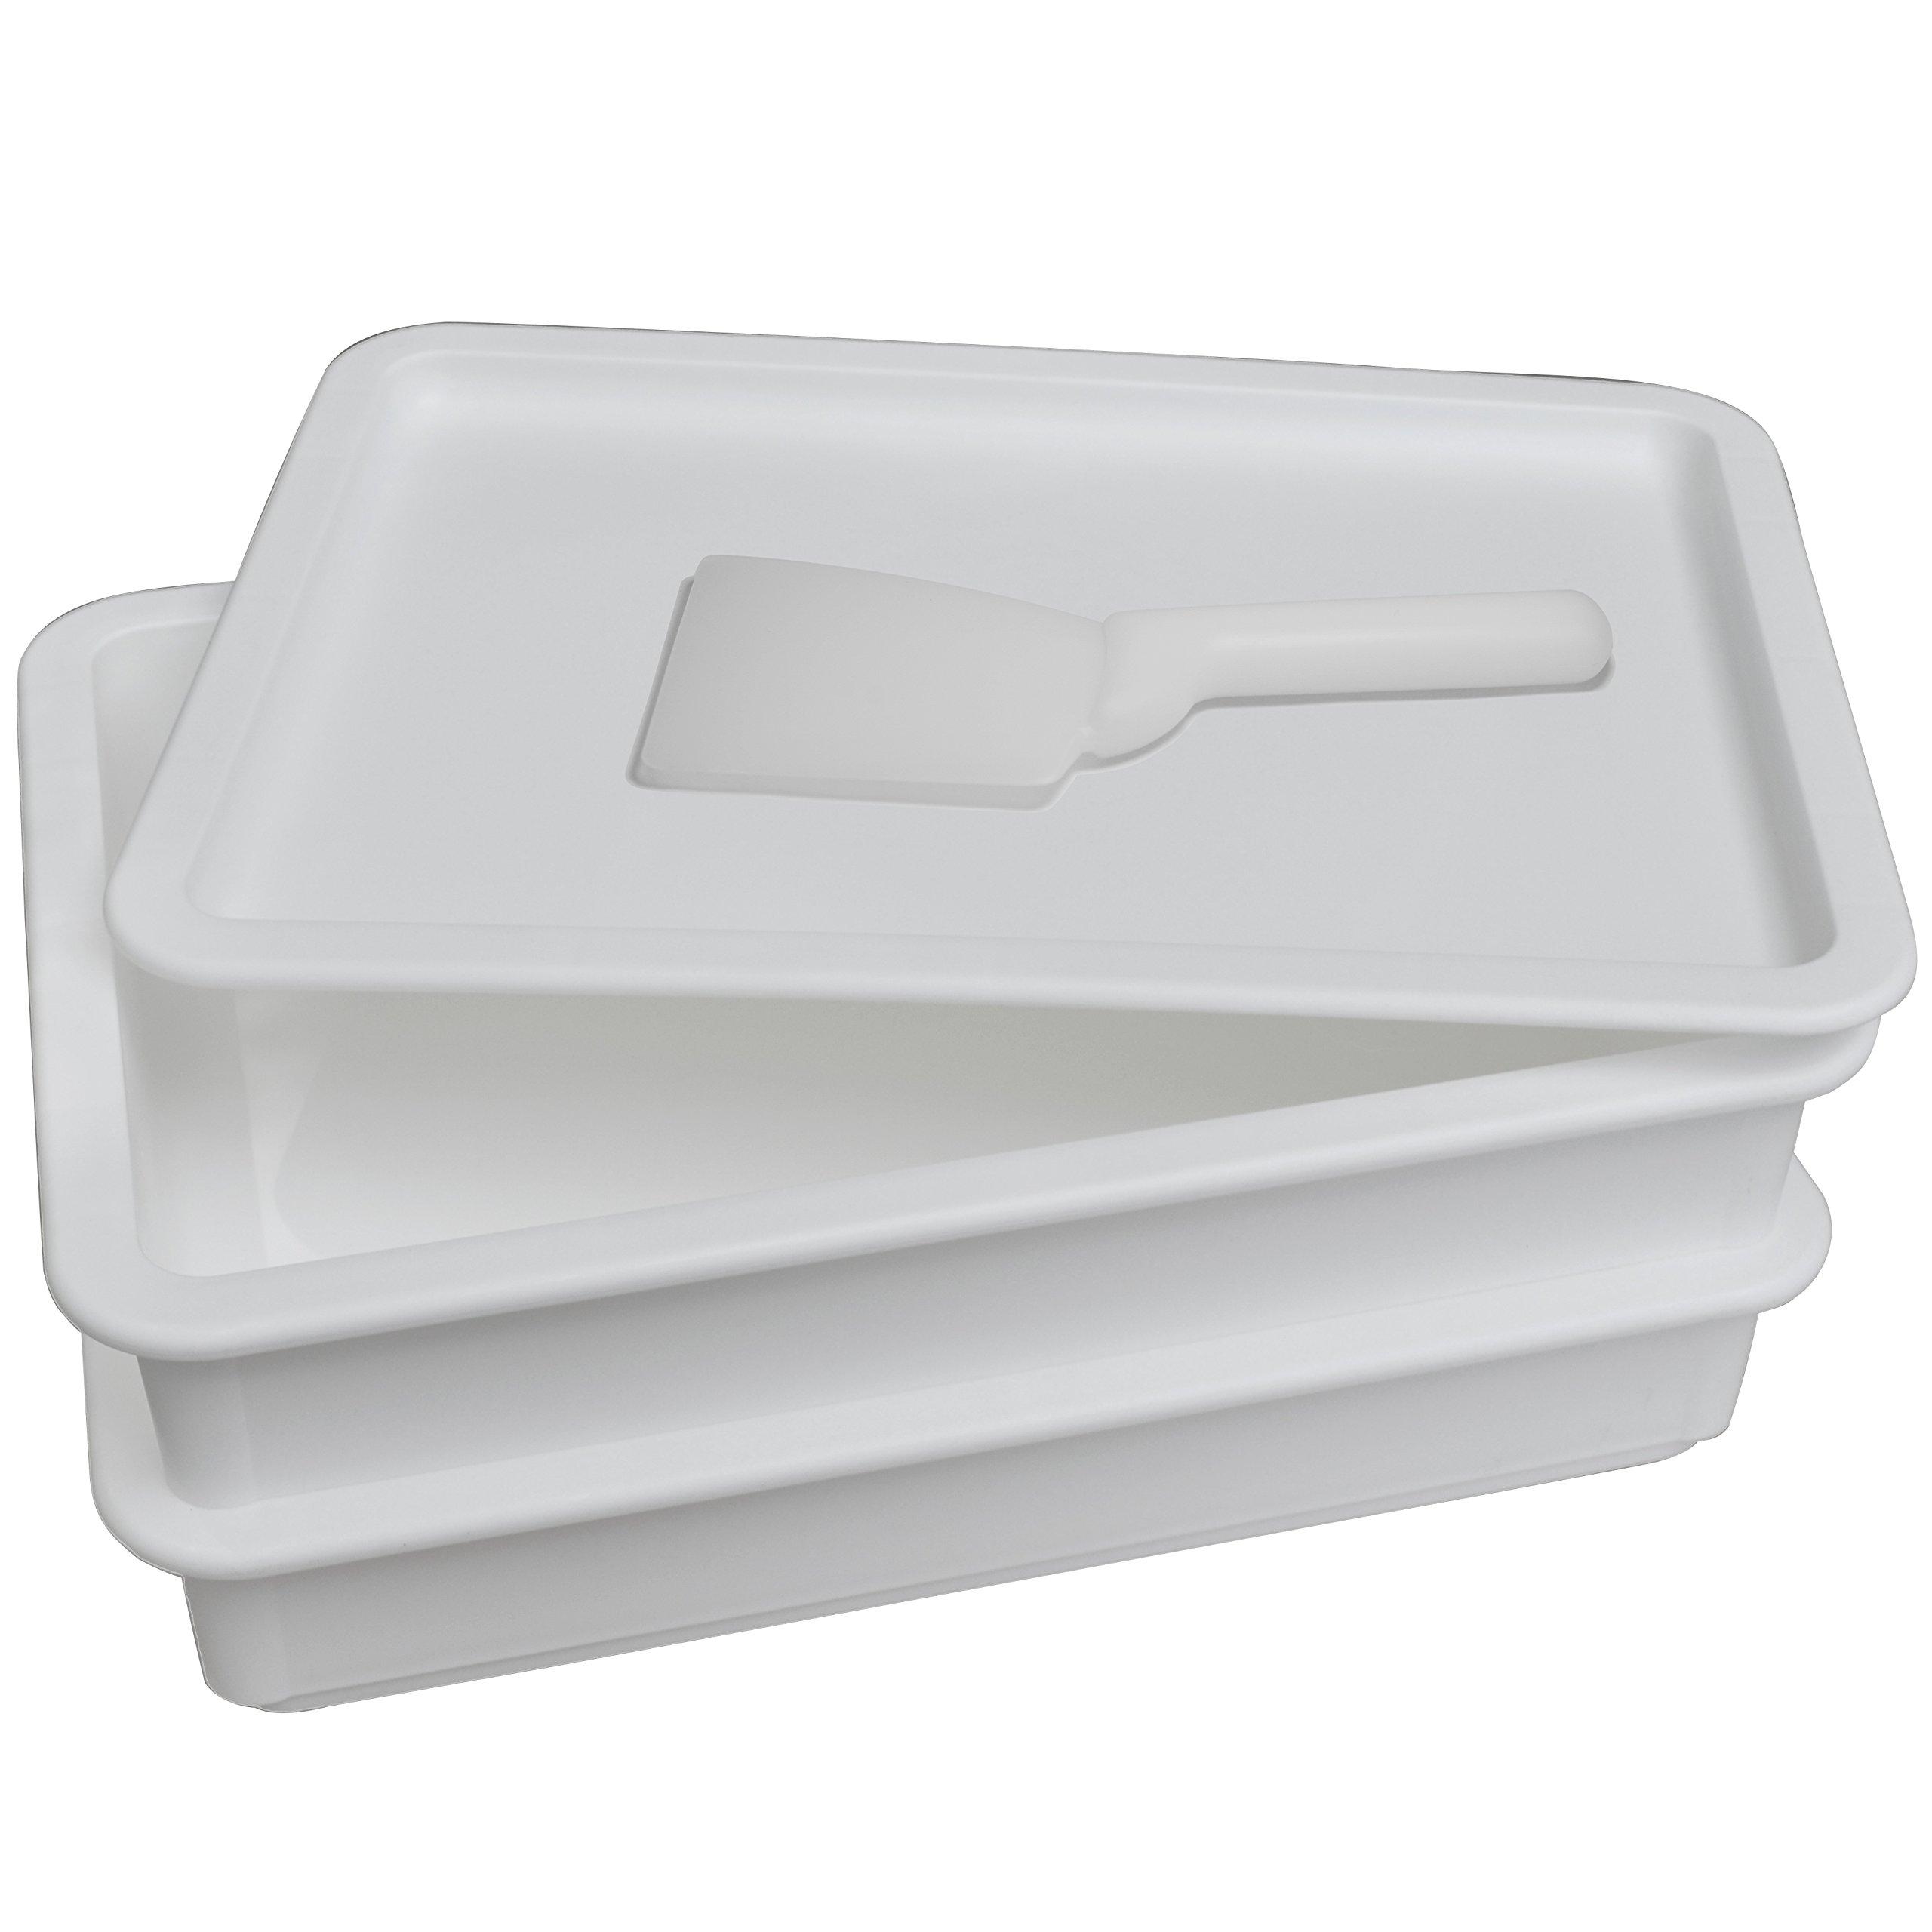 DoughMate Artisan Dough Tray Kit by DoughMate®